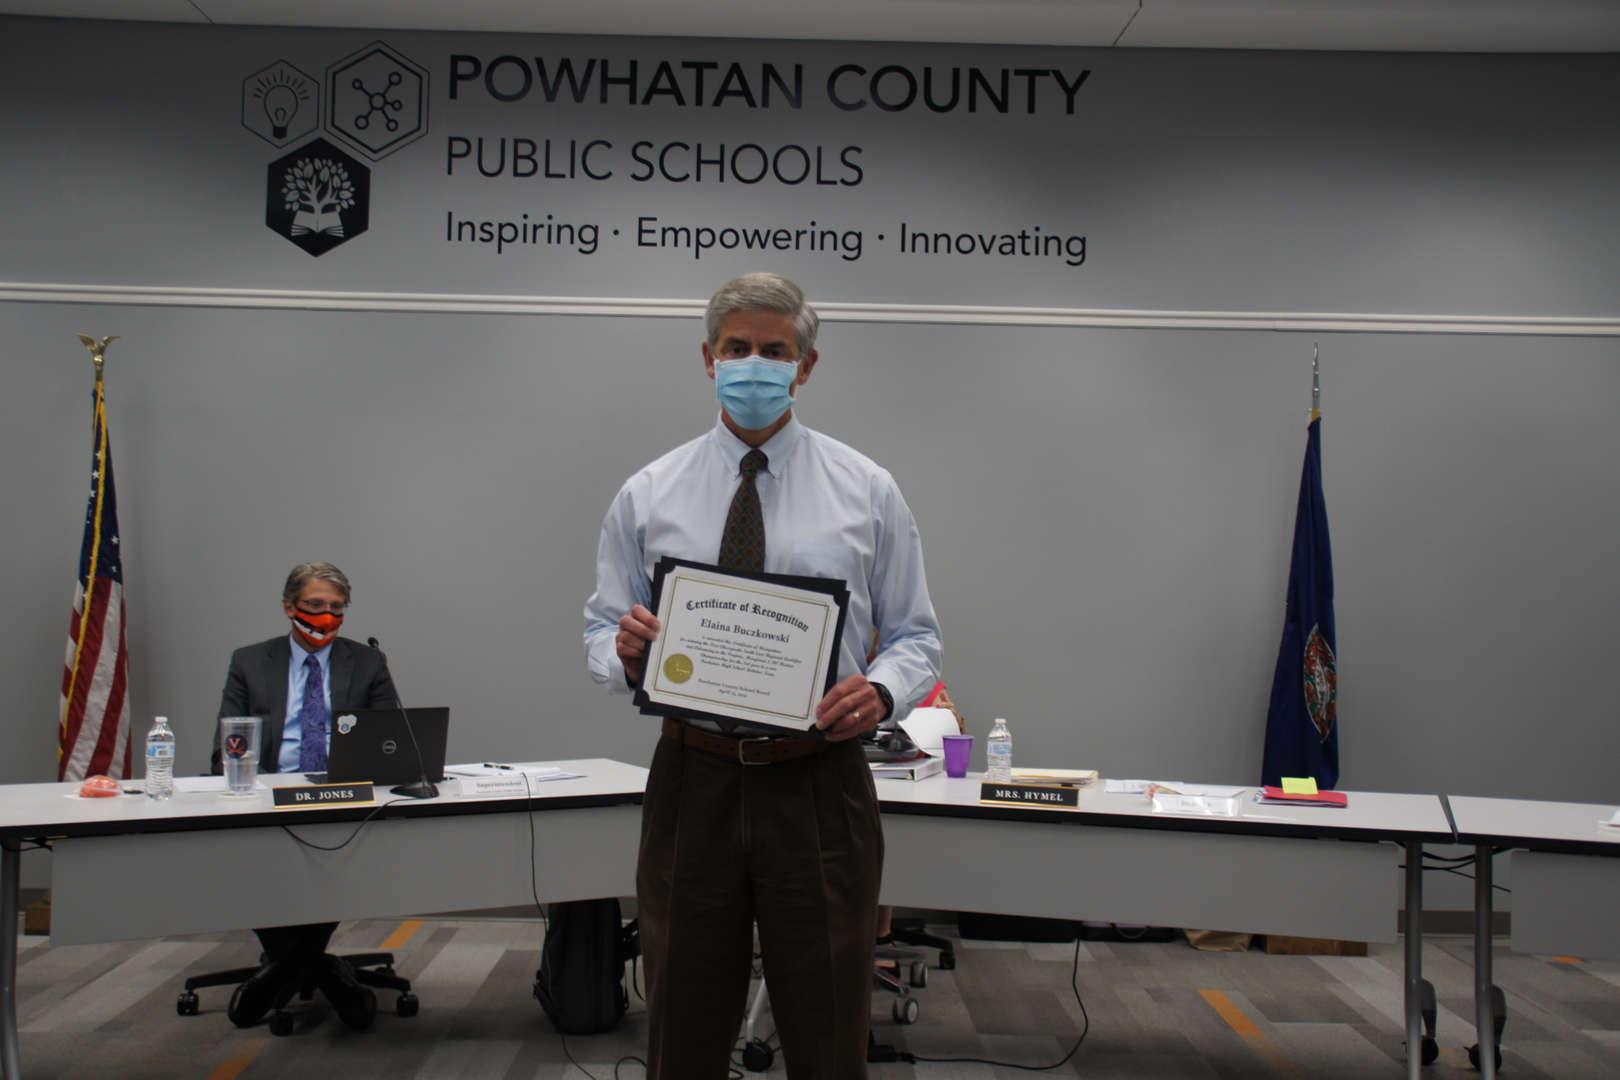 Bob Benway receives Robotics Awards for Students